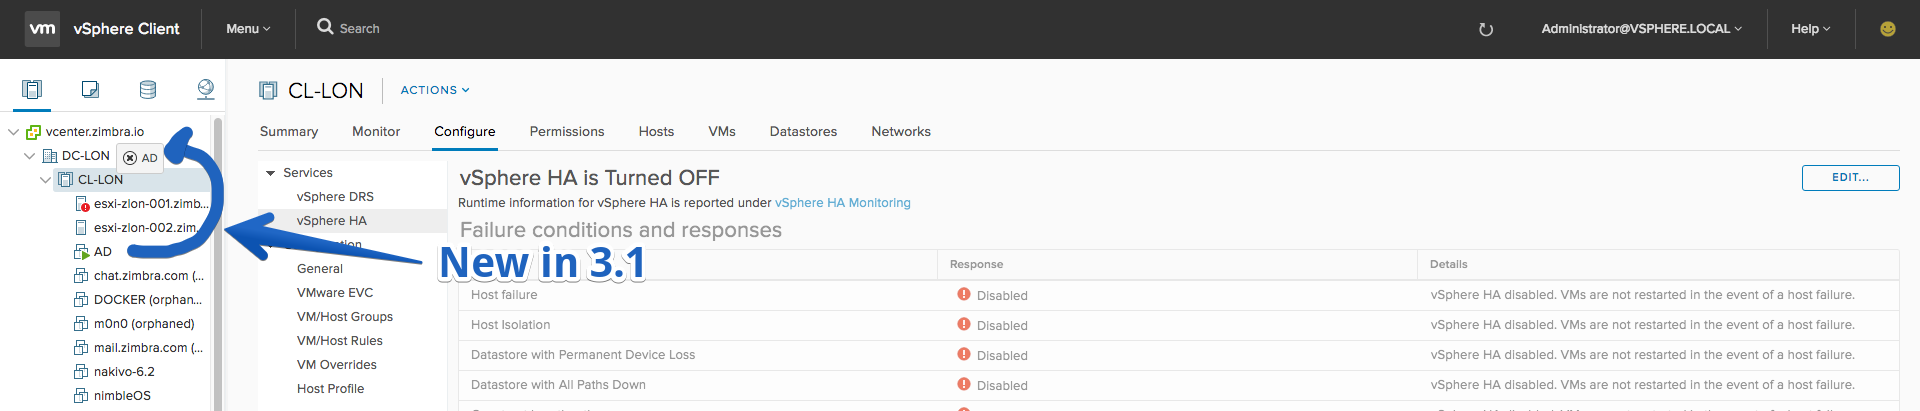 VMware: vSphere HTML5 Web Client Fling - Changelog v3 10 and